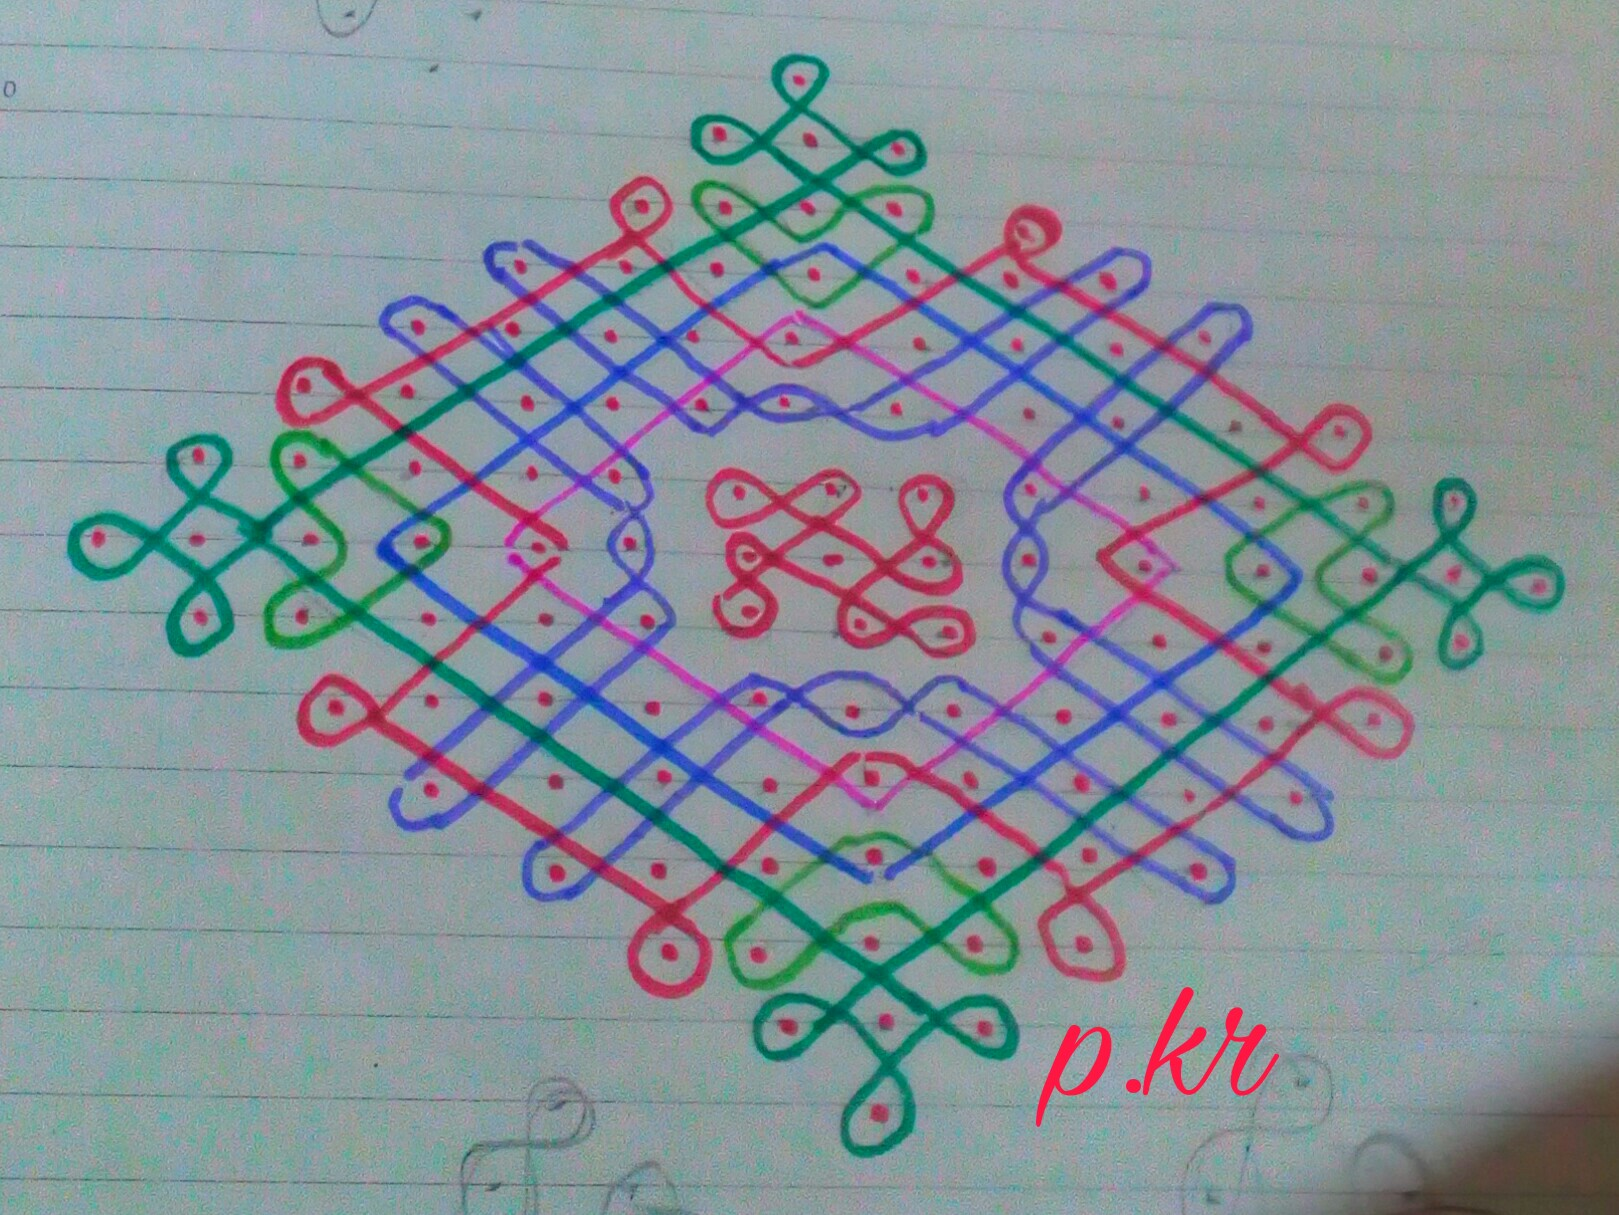 Kolam contest || Sikku kolam with 15 dots